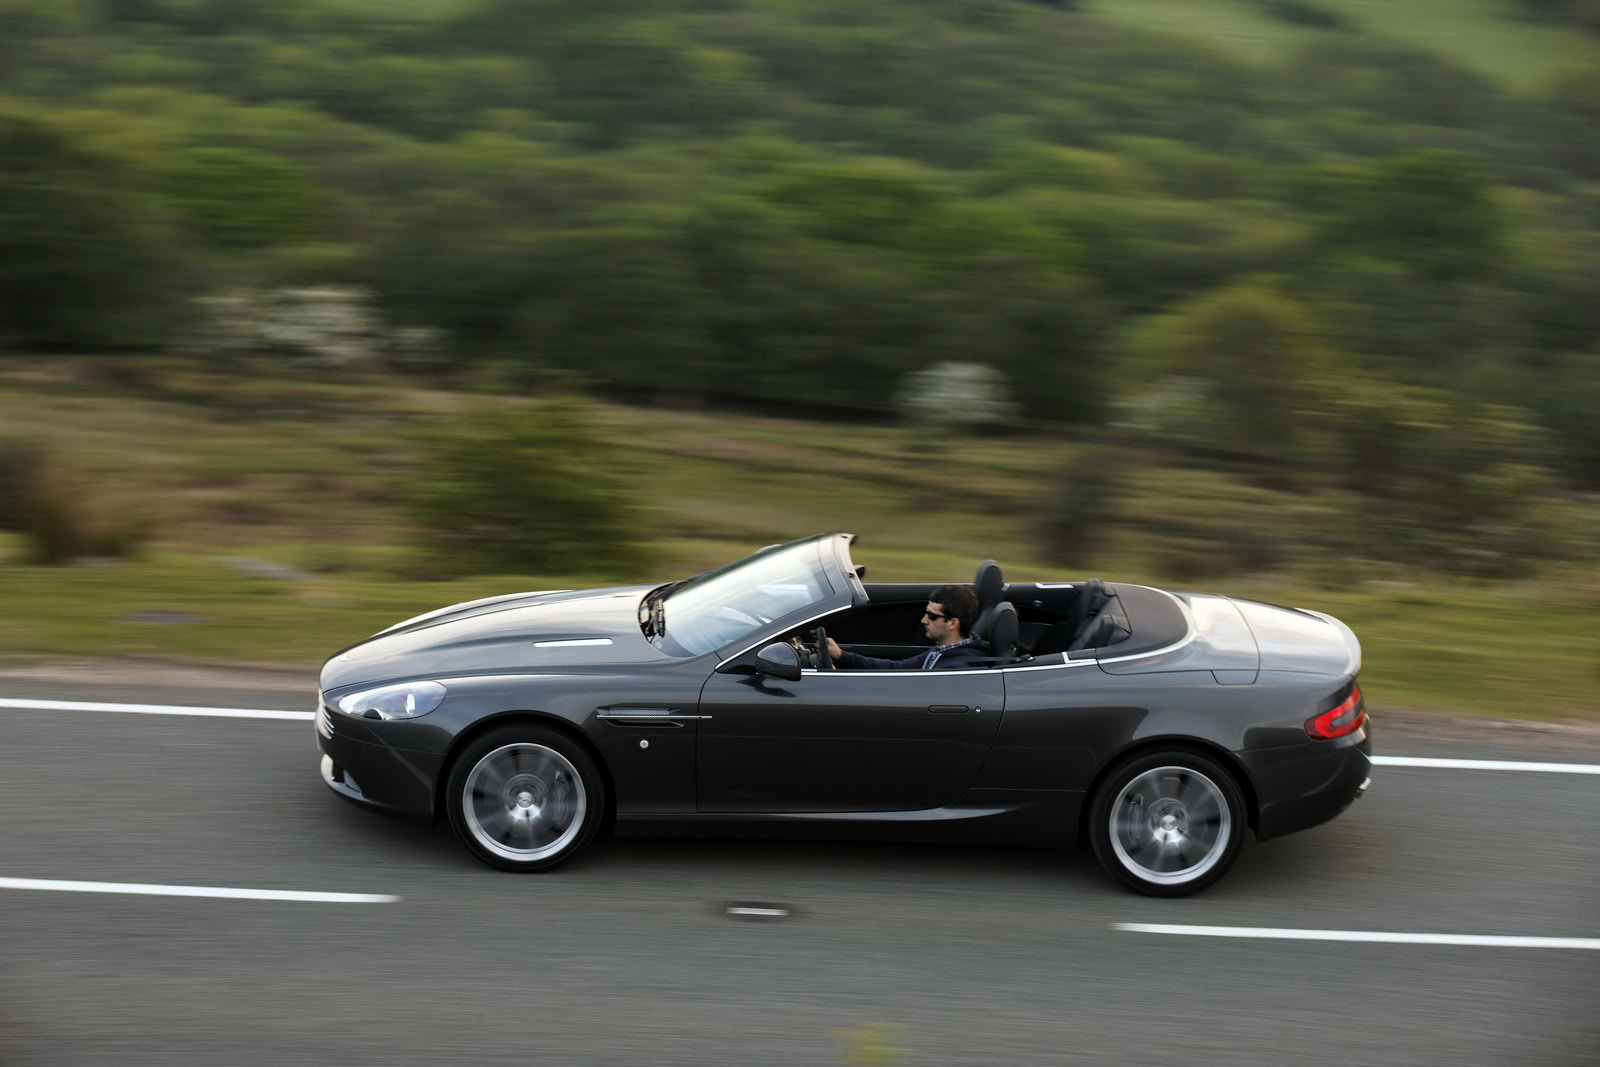 Sports Car Aston Martin Db9 Black